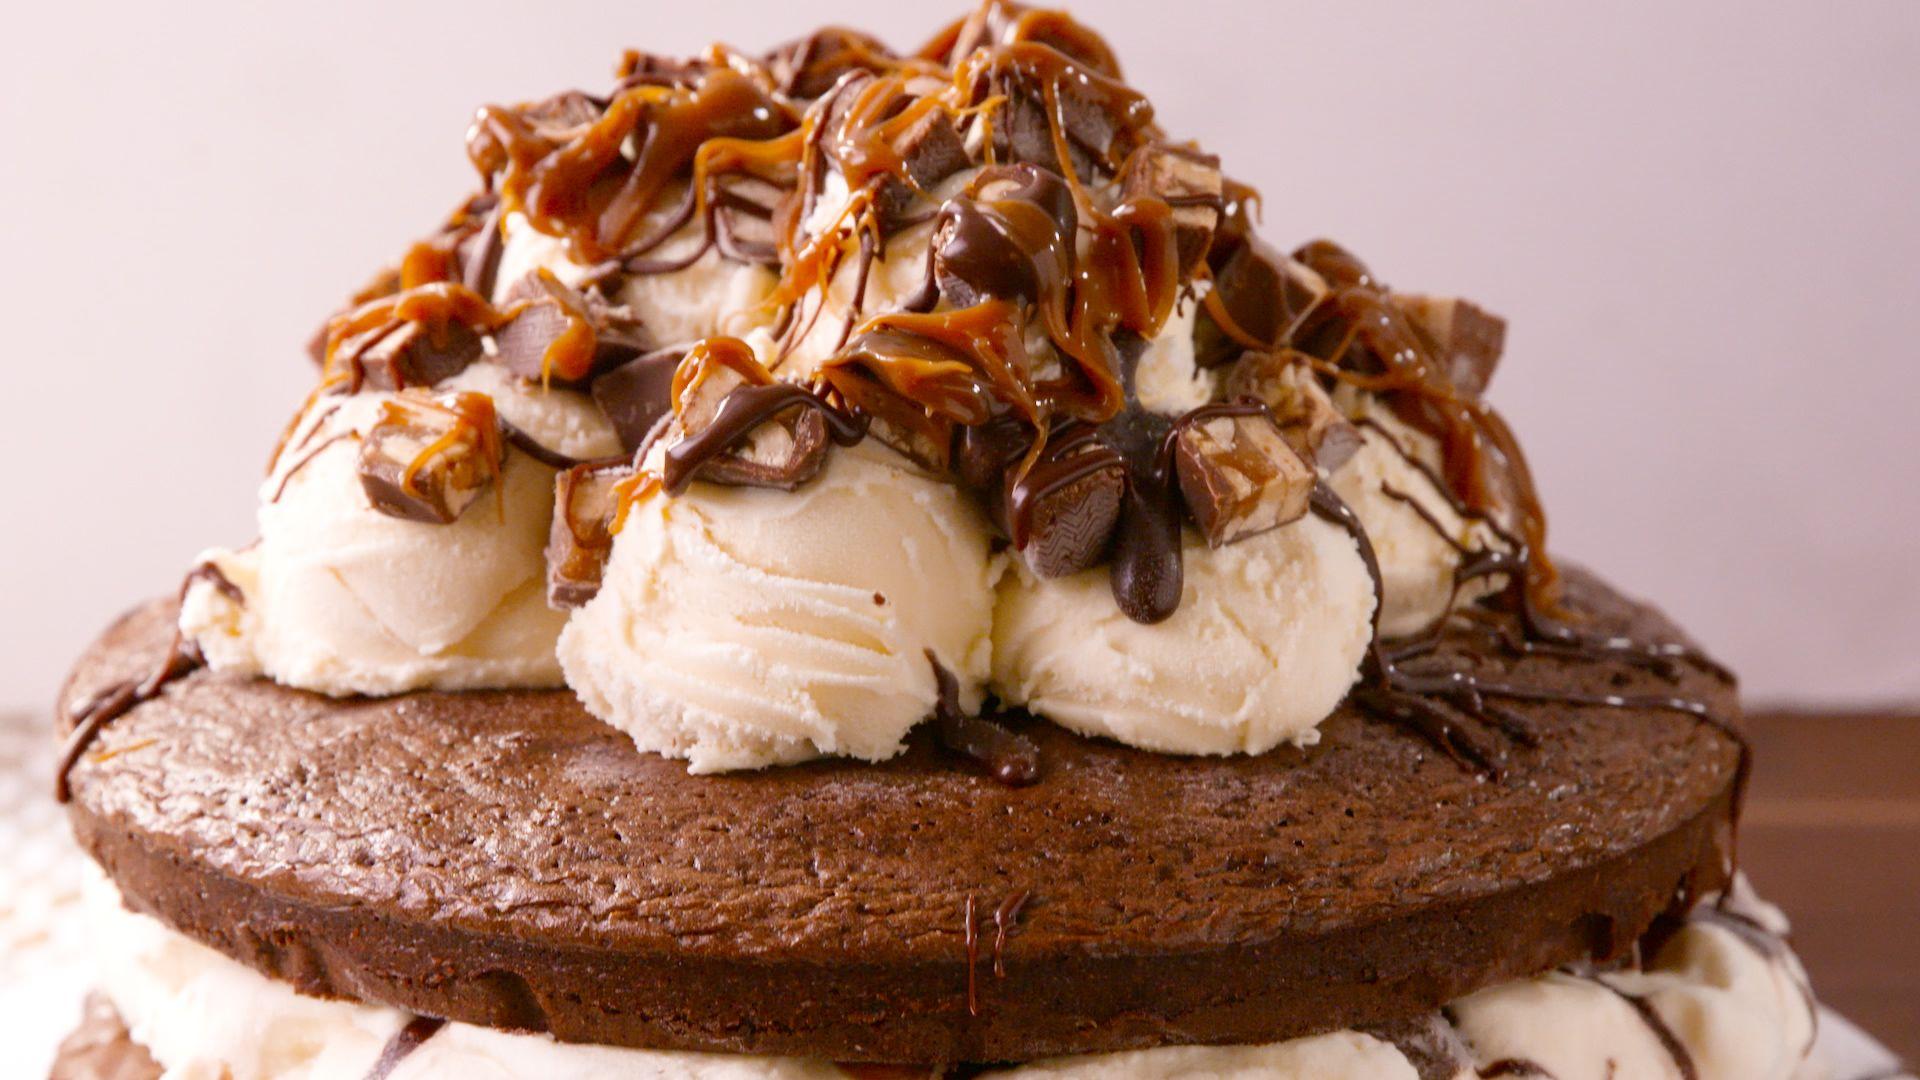 50 Best Ice Cream Cake Recipes How To Make Ice Cream Cake Delishcom